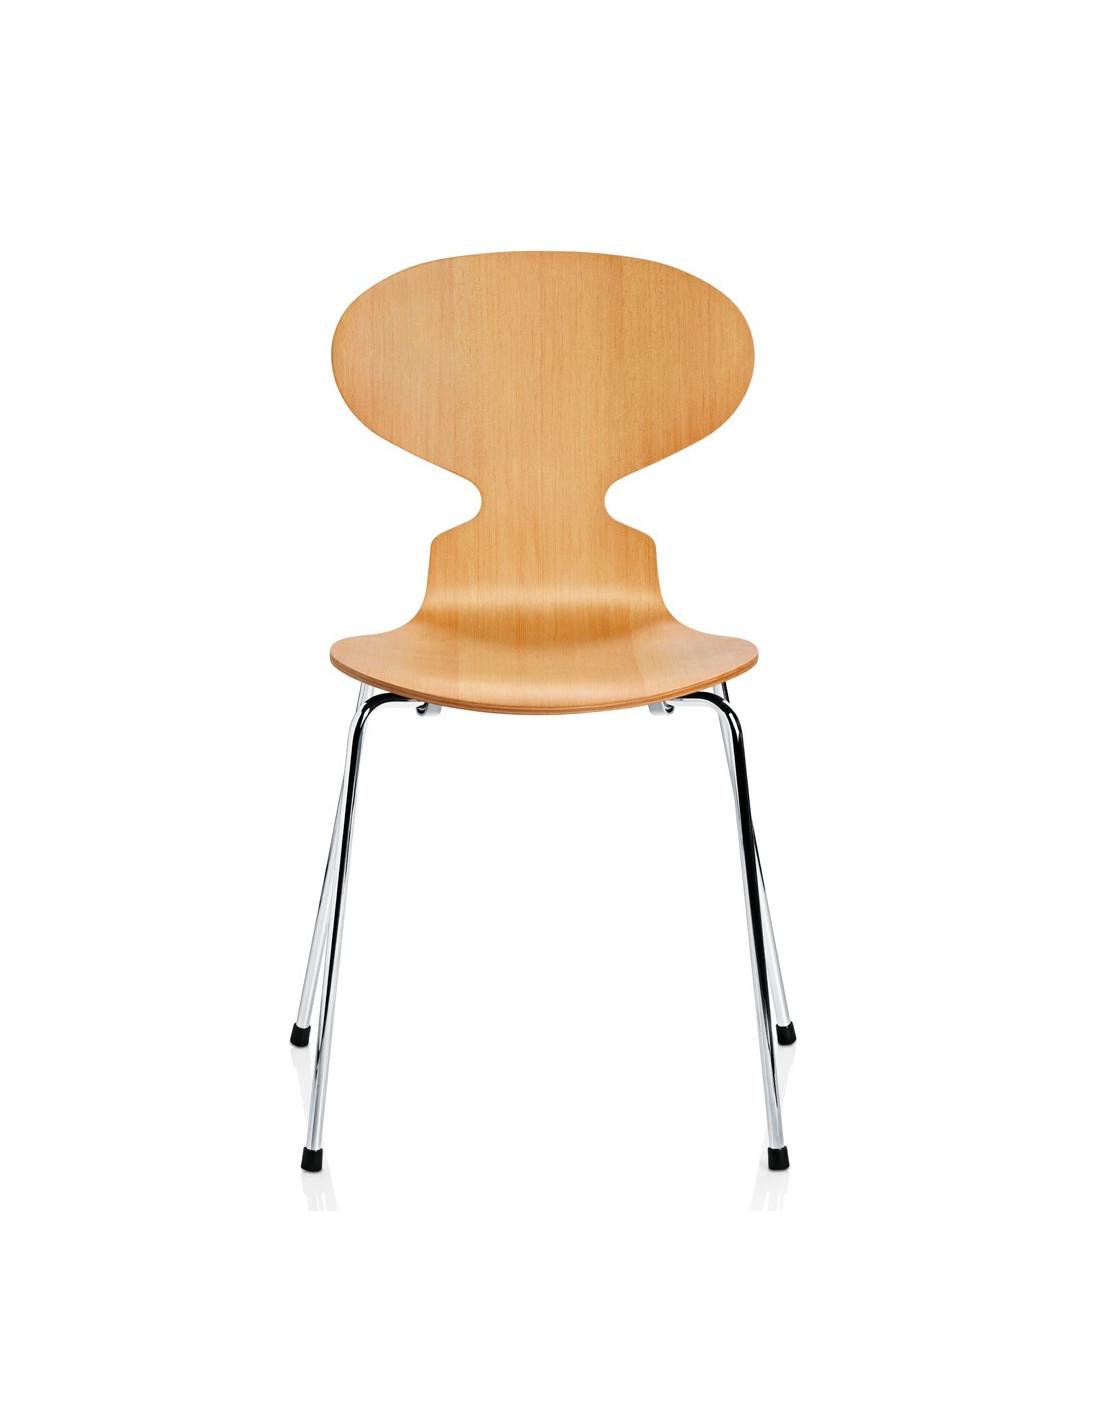 Ant Chair Arne Jacobsen Design For Fritz Hansen La Boutique Danoise